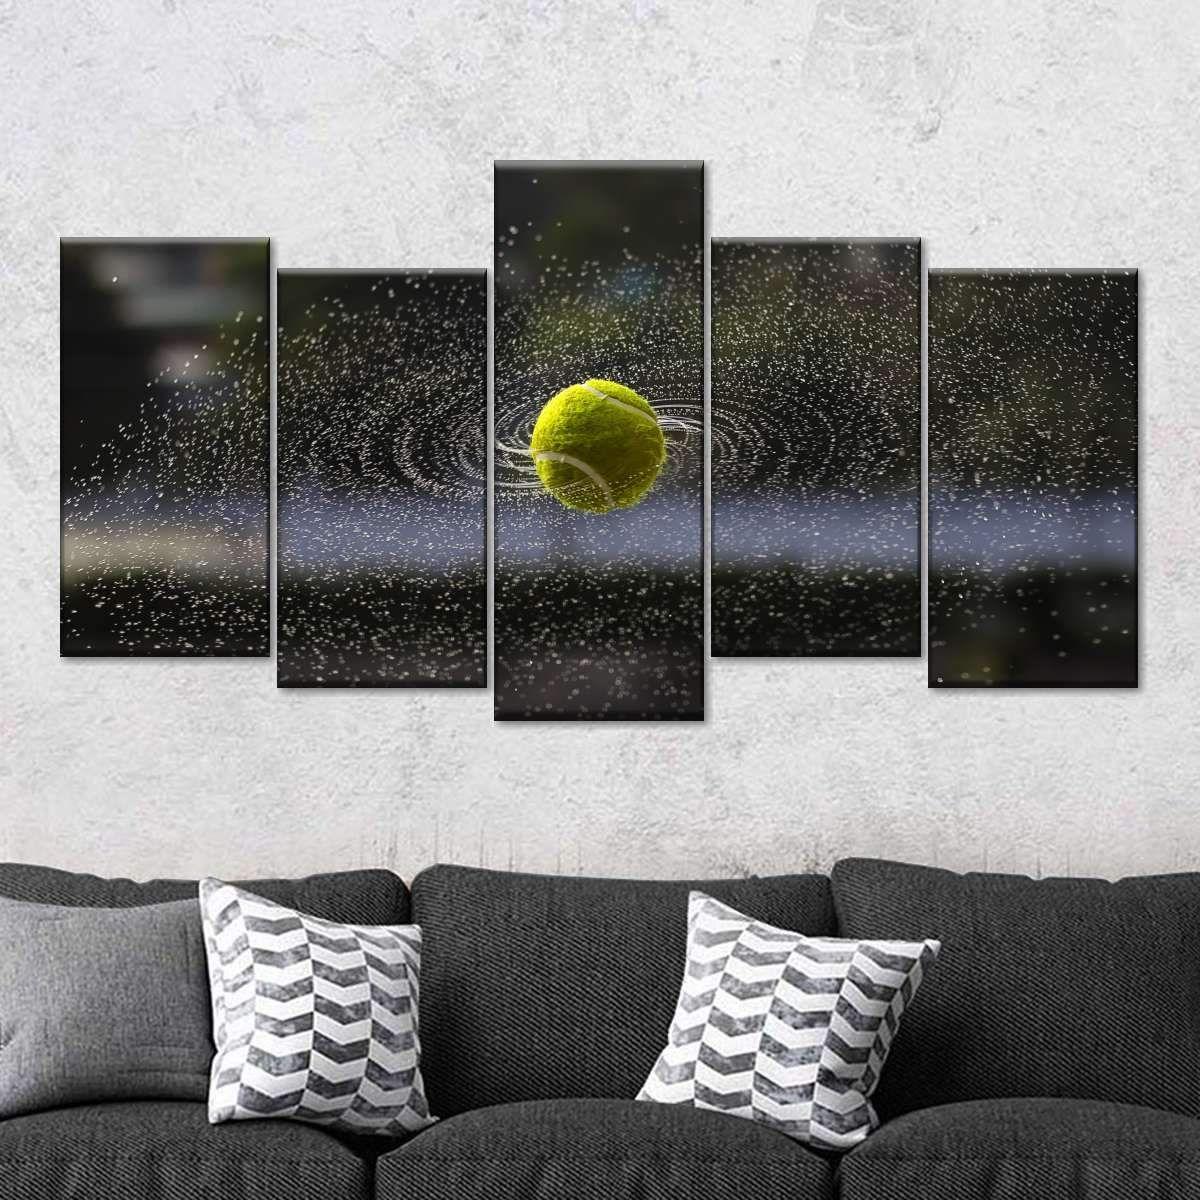 Tennis Ball Action Multi Panel Canvas Wall Art In 2020 Wall Canvas Wall Art Wall